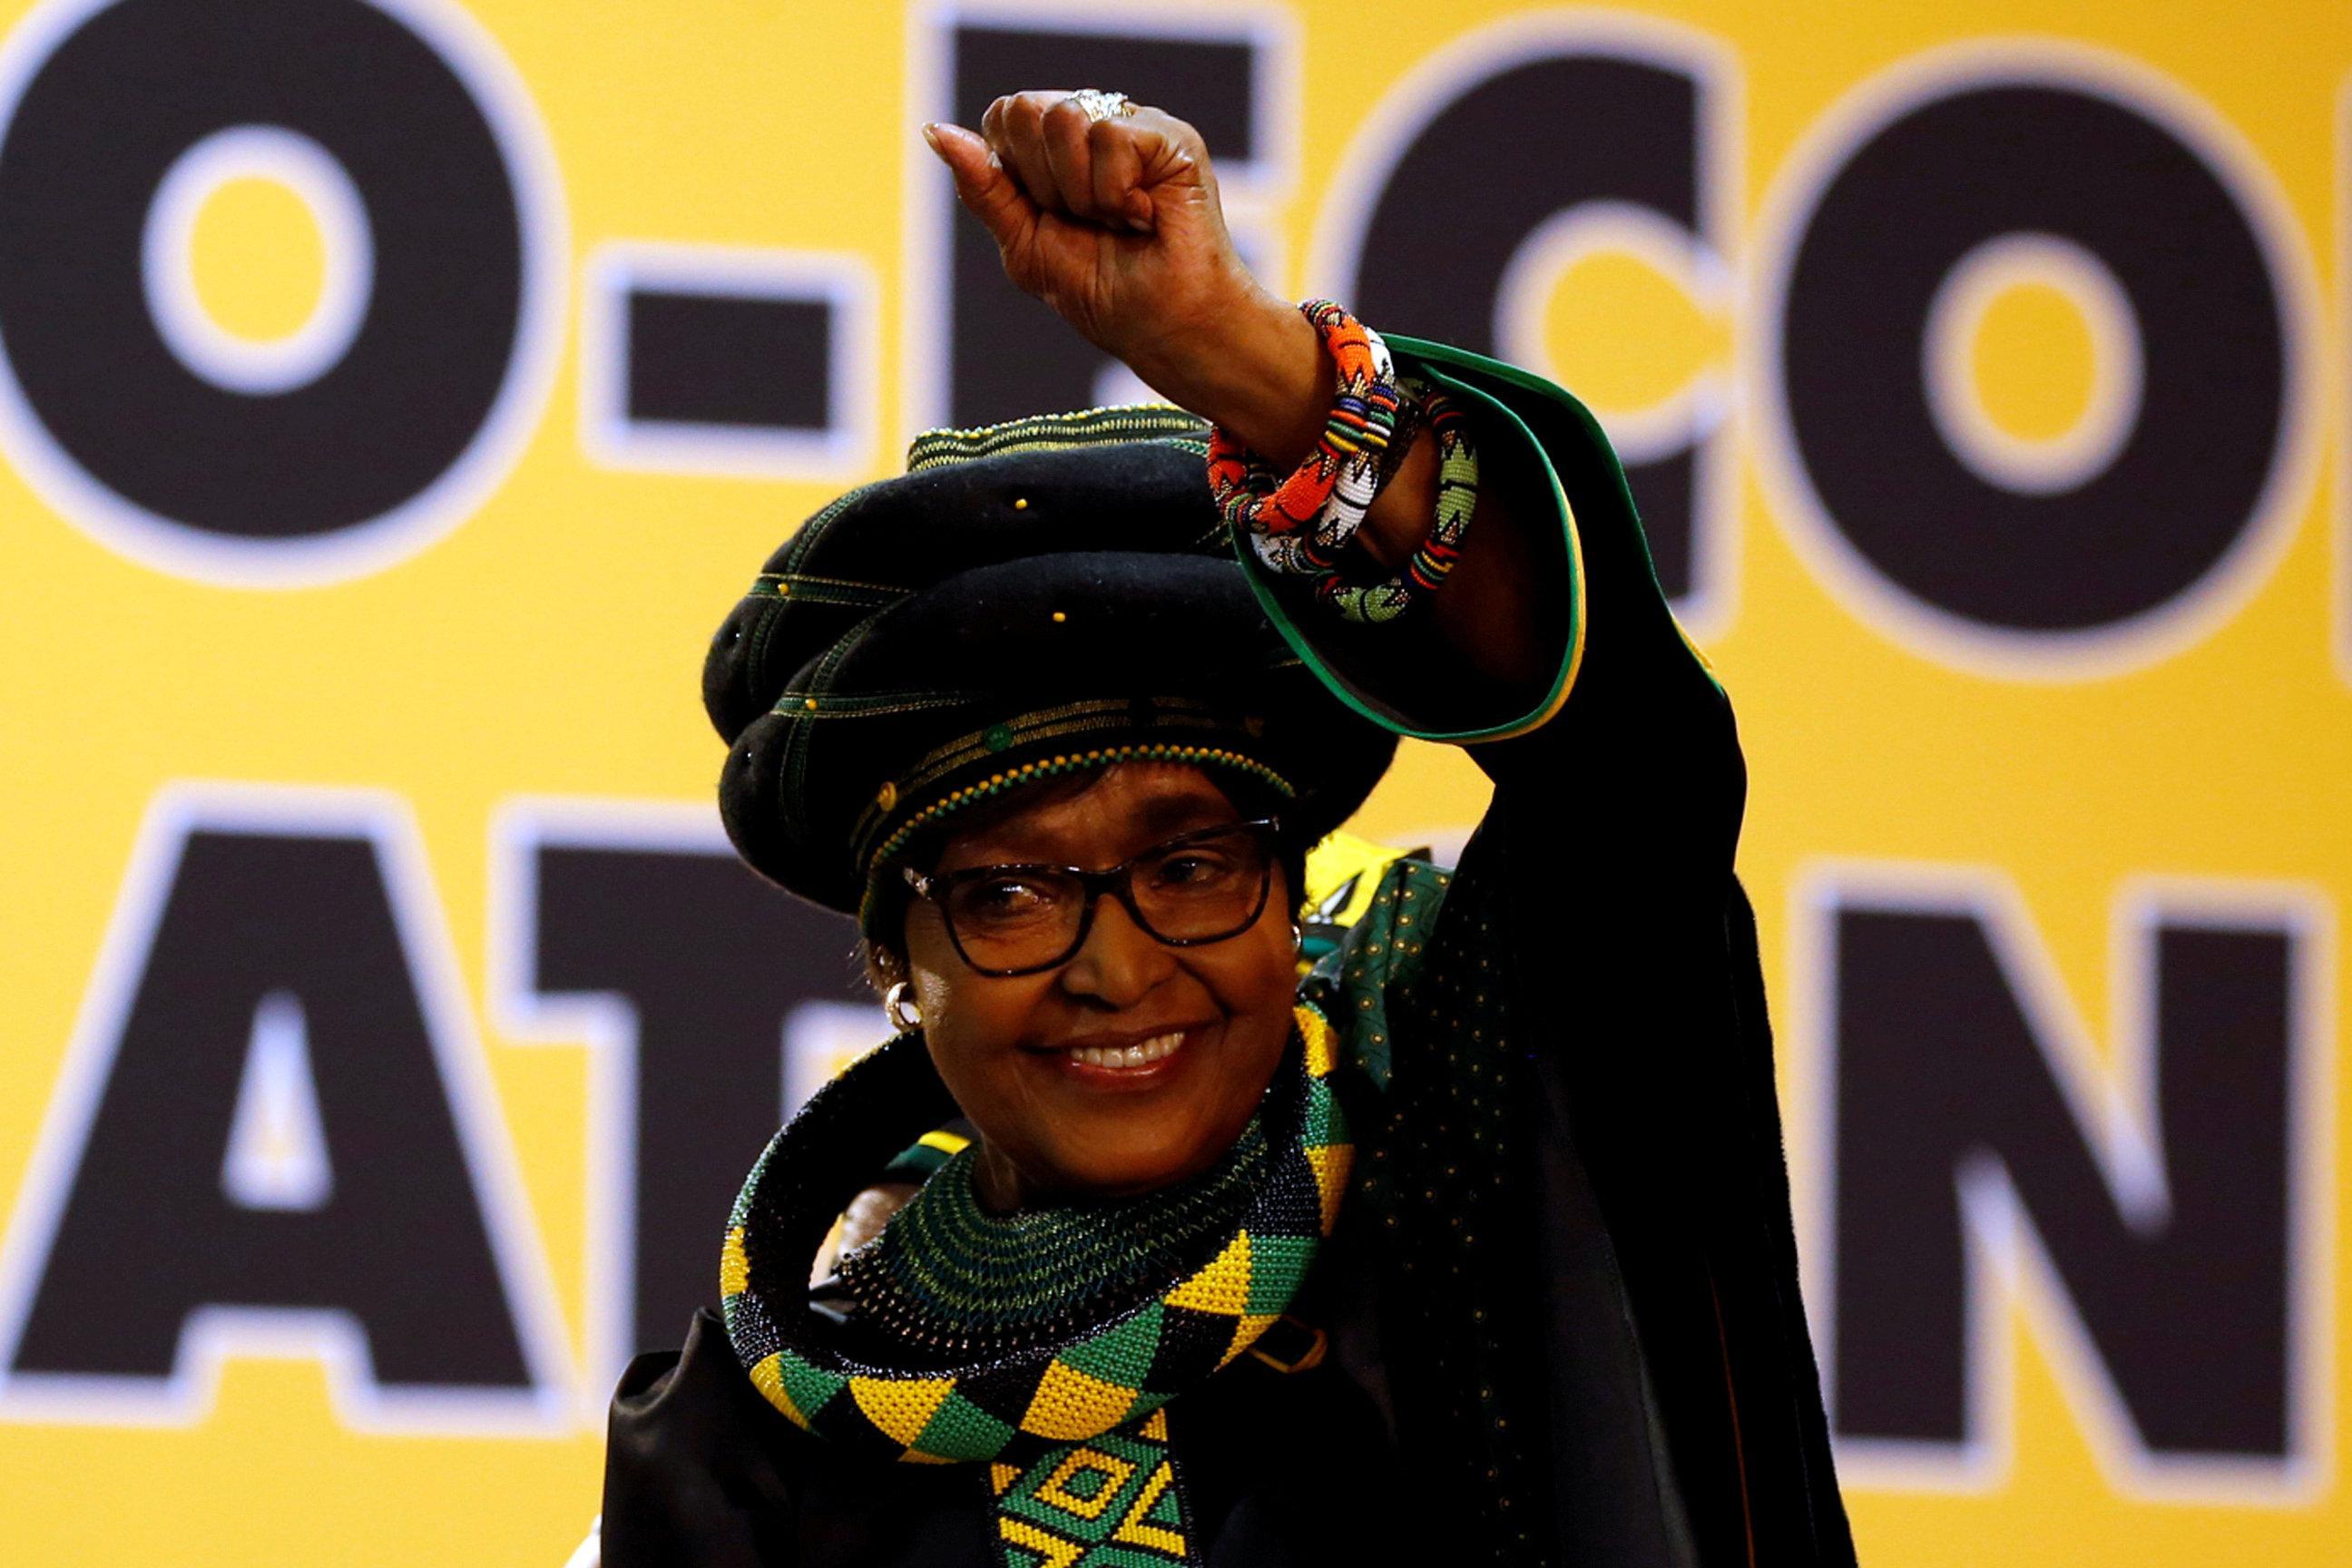 Winnie Mandela, tarnished 'Mother' of post-apartheid South Africa